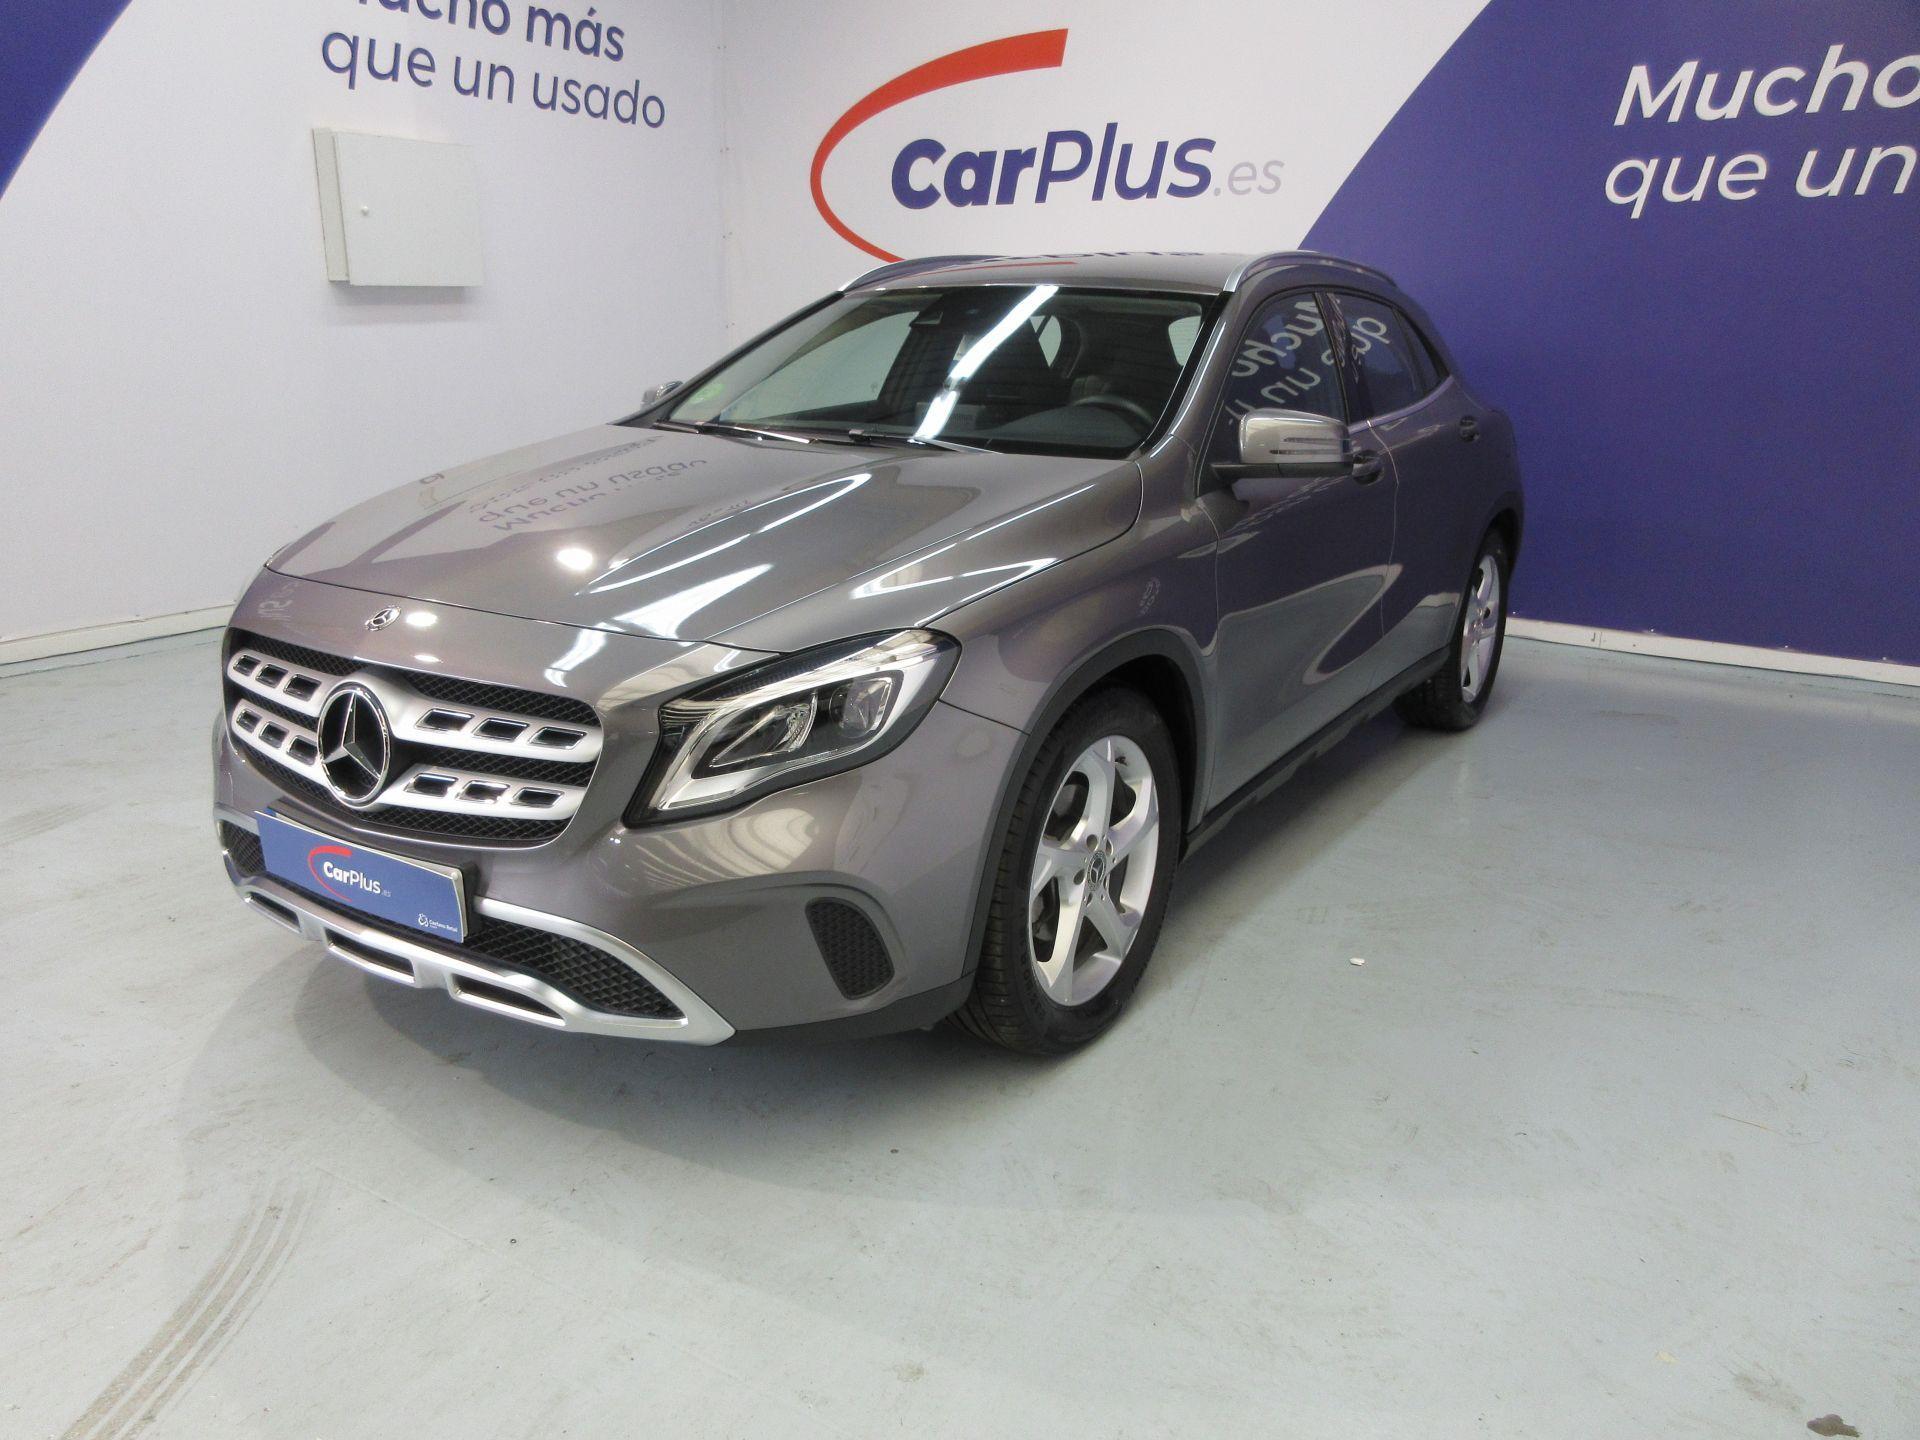 Mercedes Benz GLA ocasión segunda mano 2017 Diésel por 26.490€ en Madrid